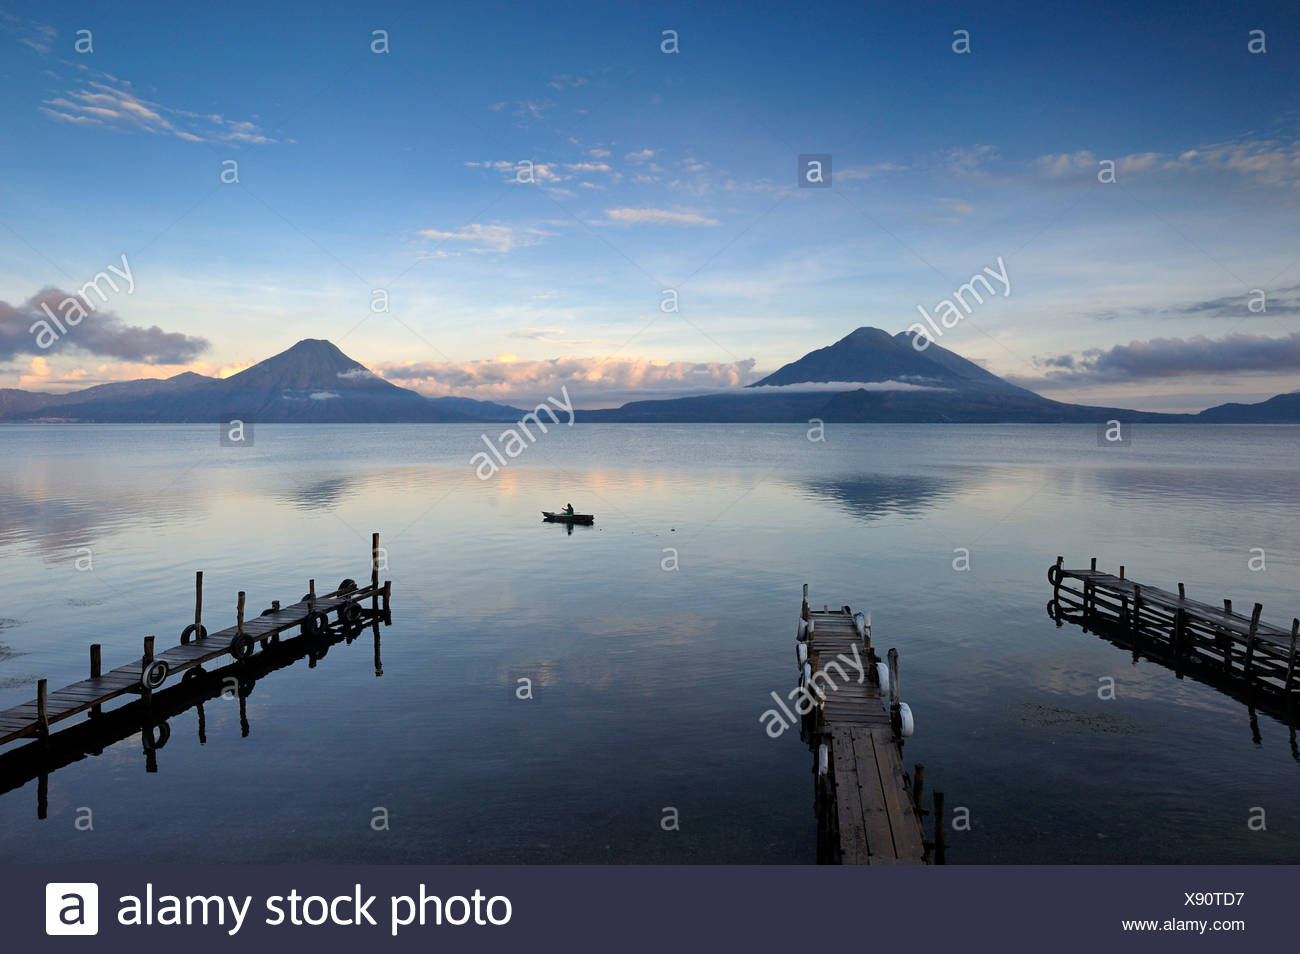 Lake Atitlan, San Pedro volcano, Toliman volcano, Atitlan, fisherman, Guatemala, Central America - Stock Image